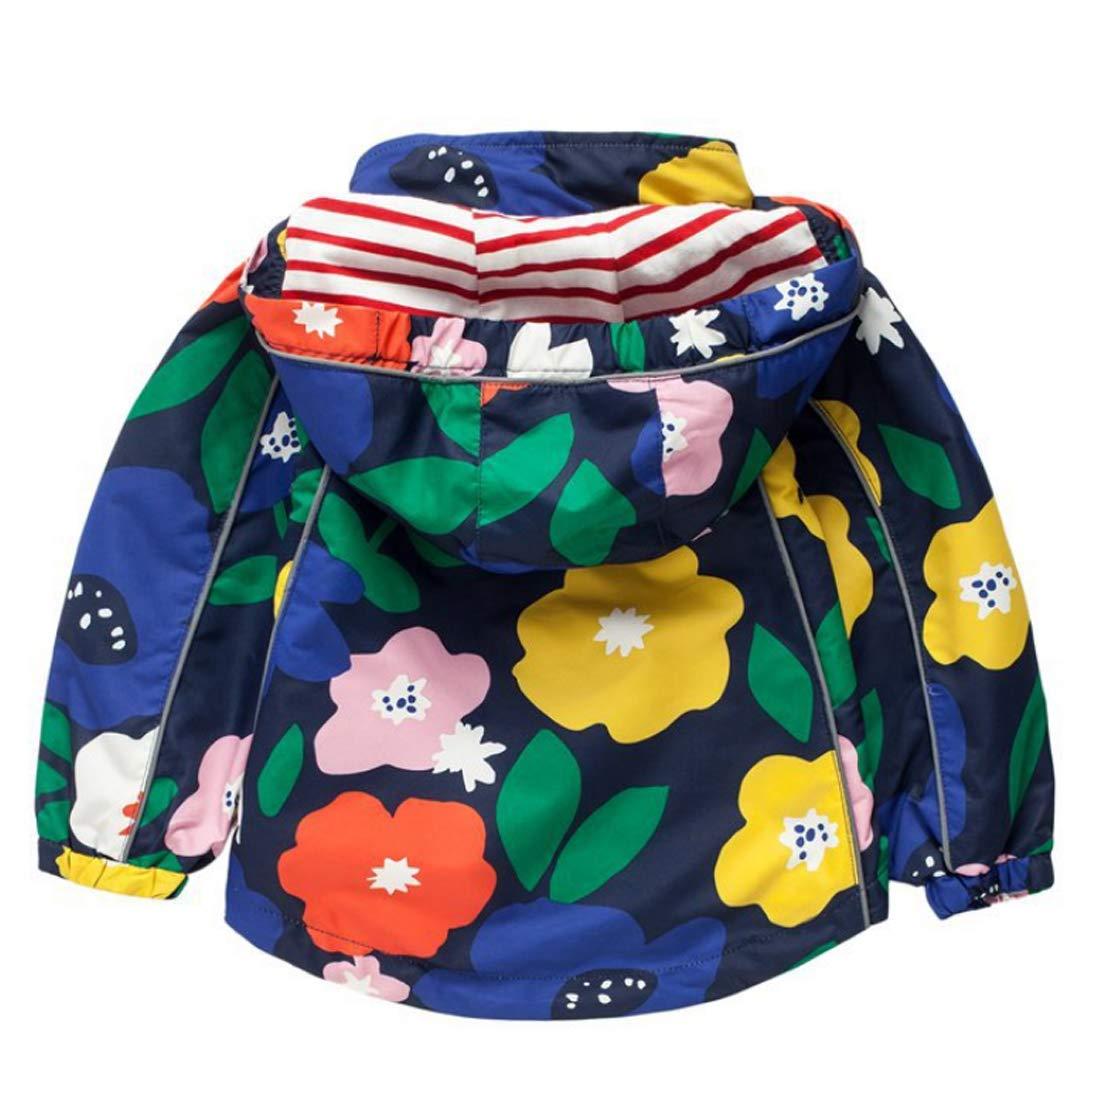 Fulision 2-8 Years Rainproof Jacket Kids Raincoat Rainbow Waterproof Jacket